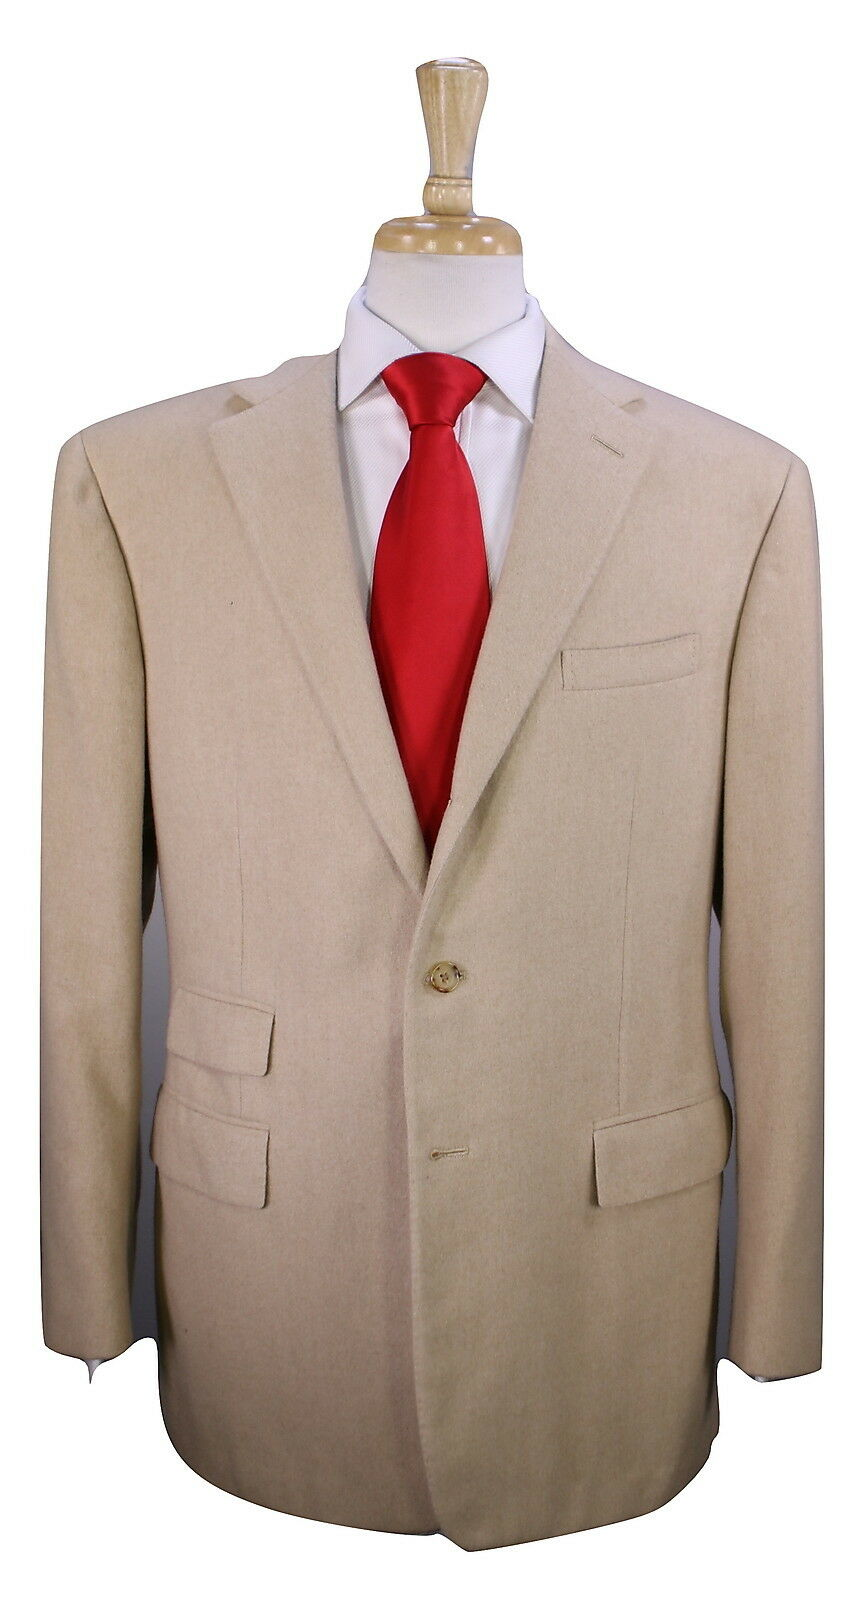 RALPH LAUREN  lila Label ITALY Solid Camel 100% Cashmere 2-Btn Suit 42R